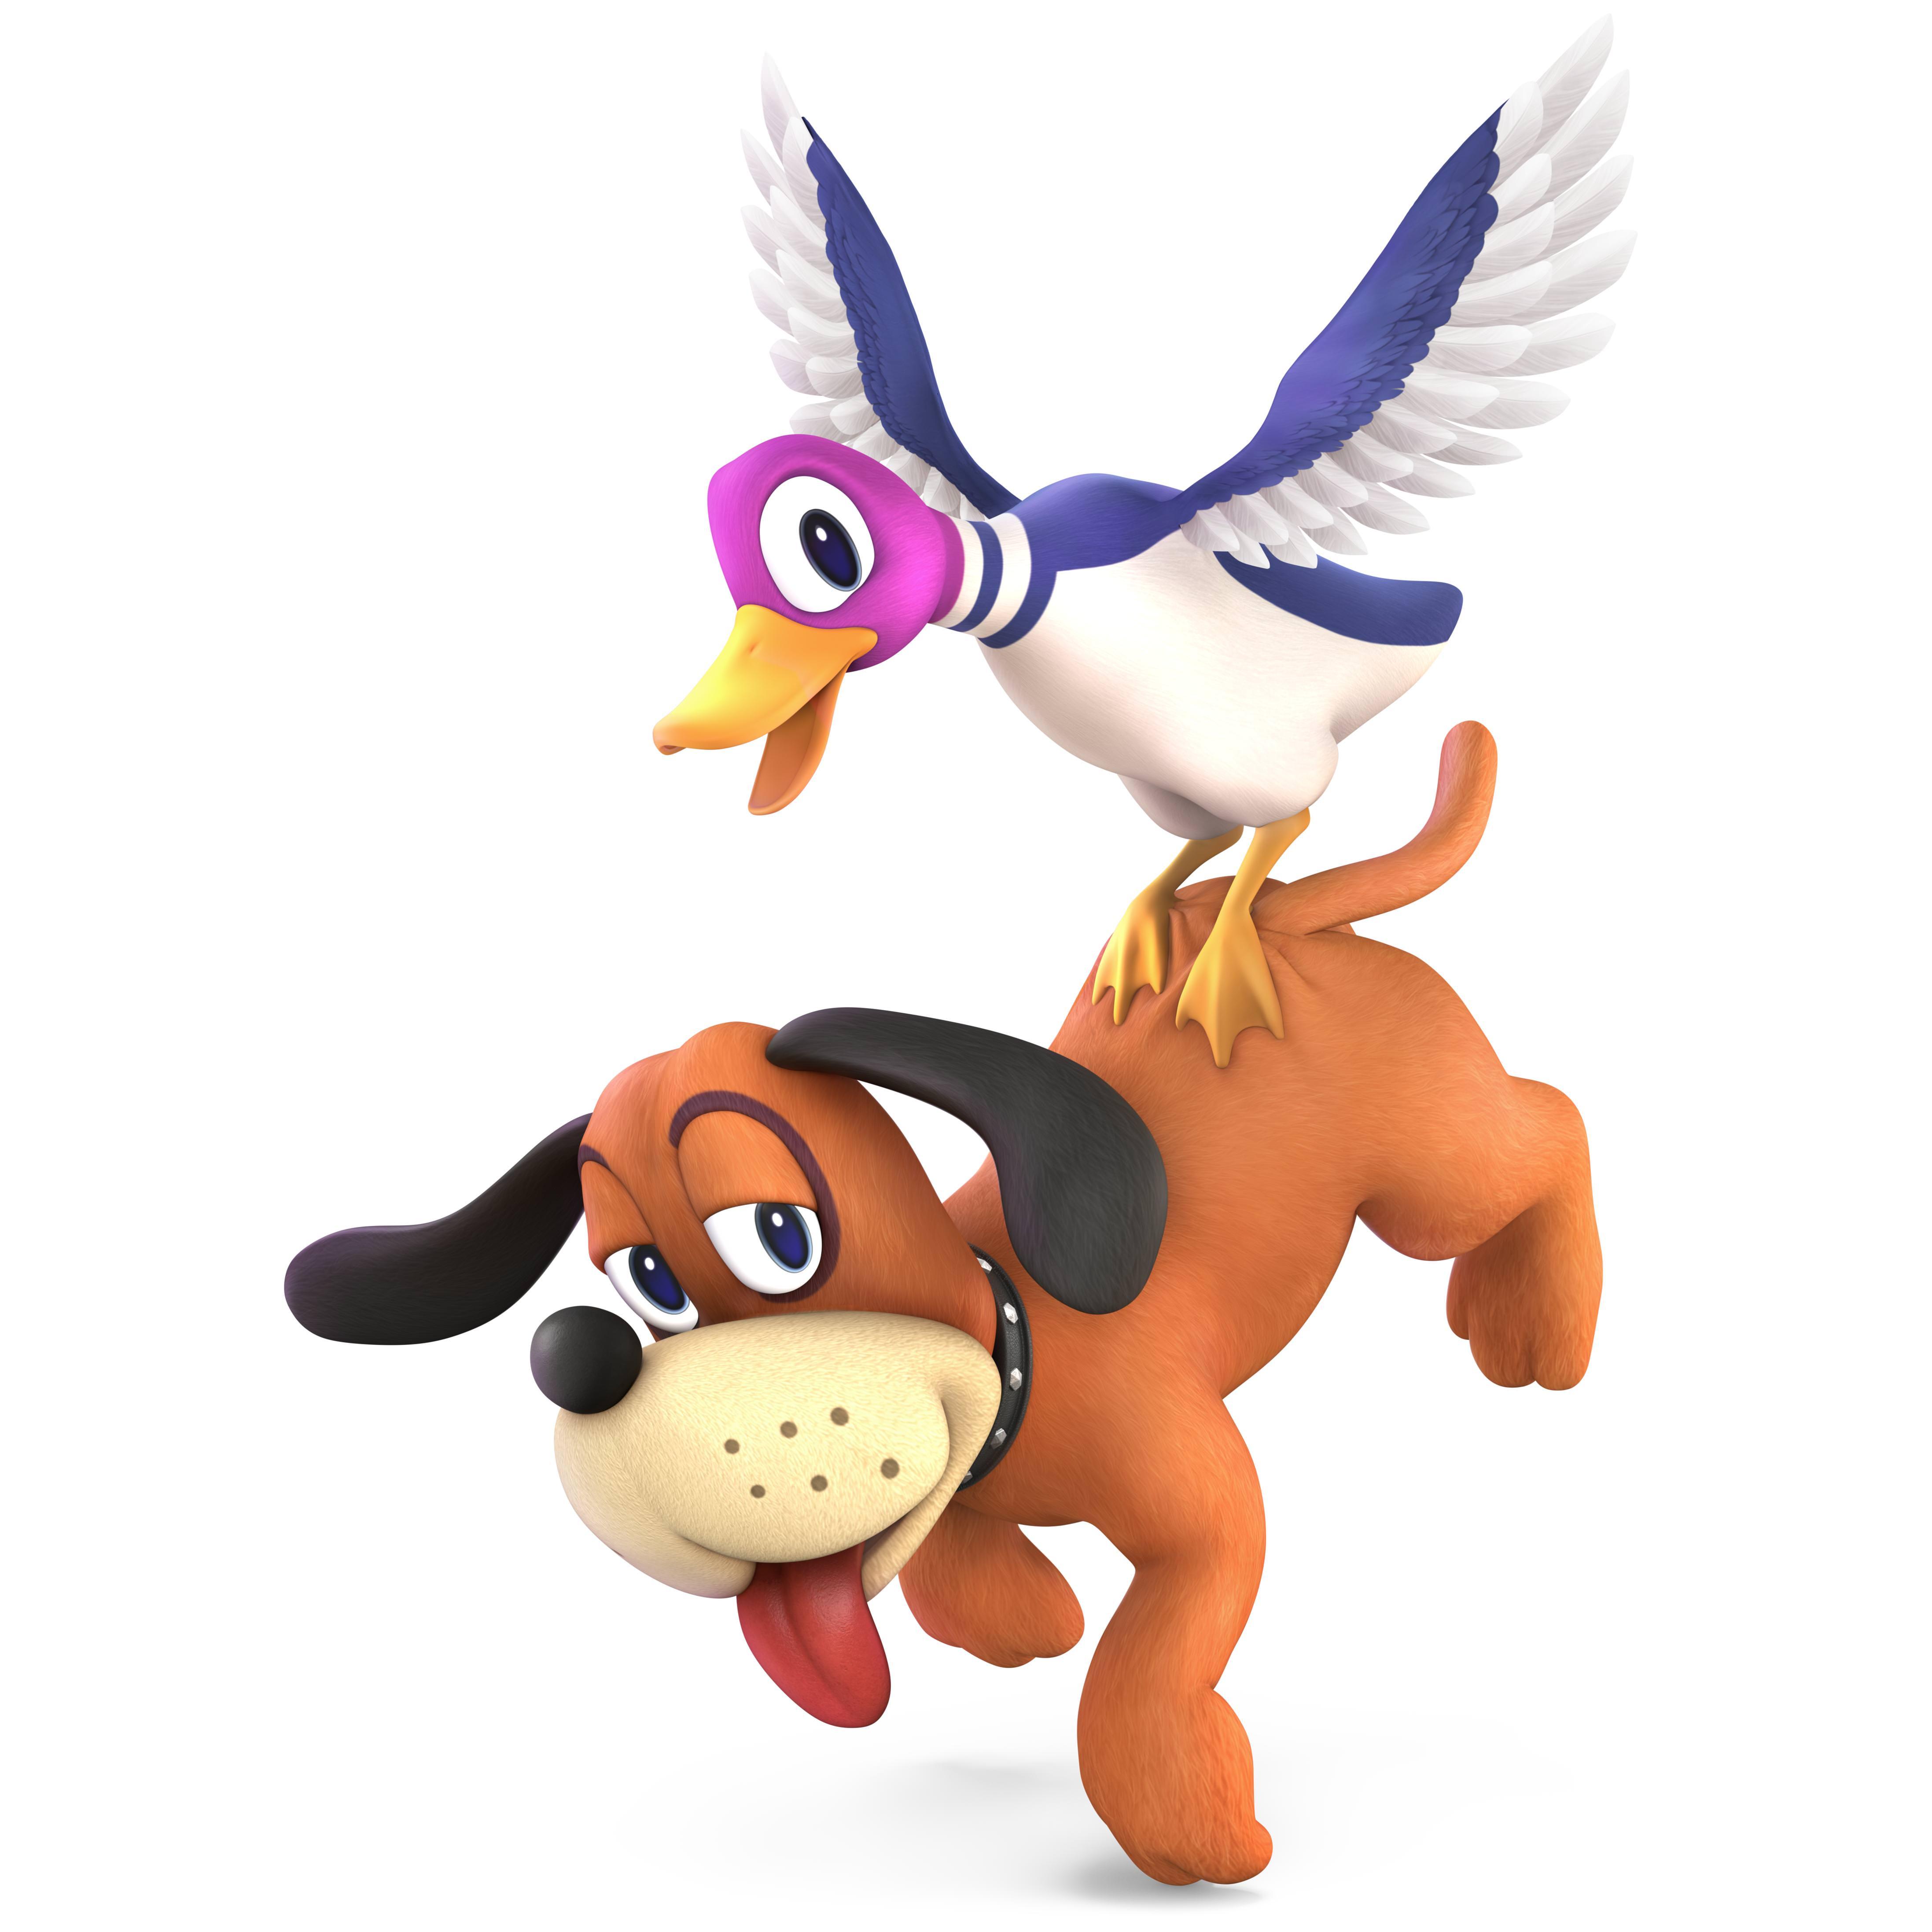 Super Smash Bros Ultimate How To Unlock Duck Hunt Duo